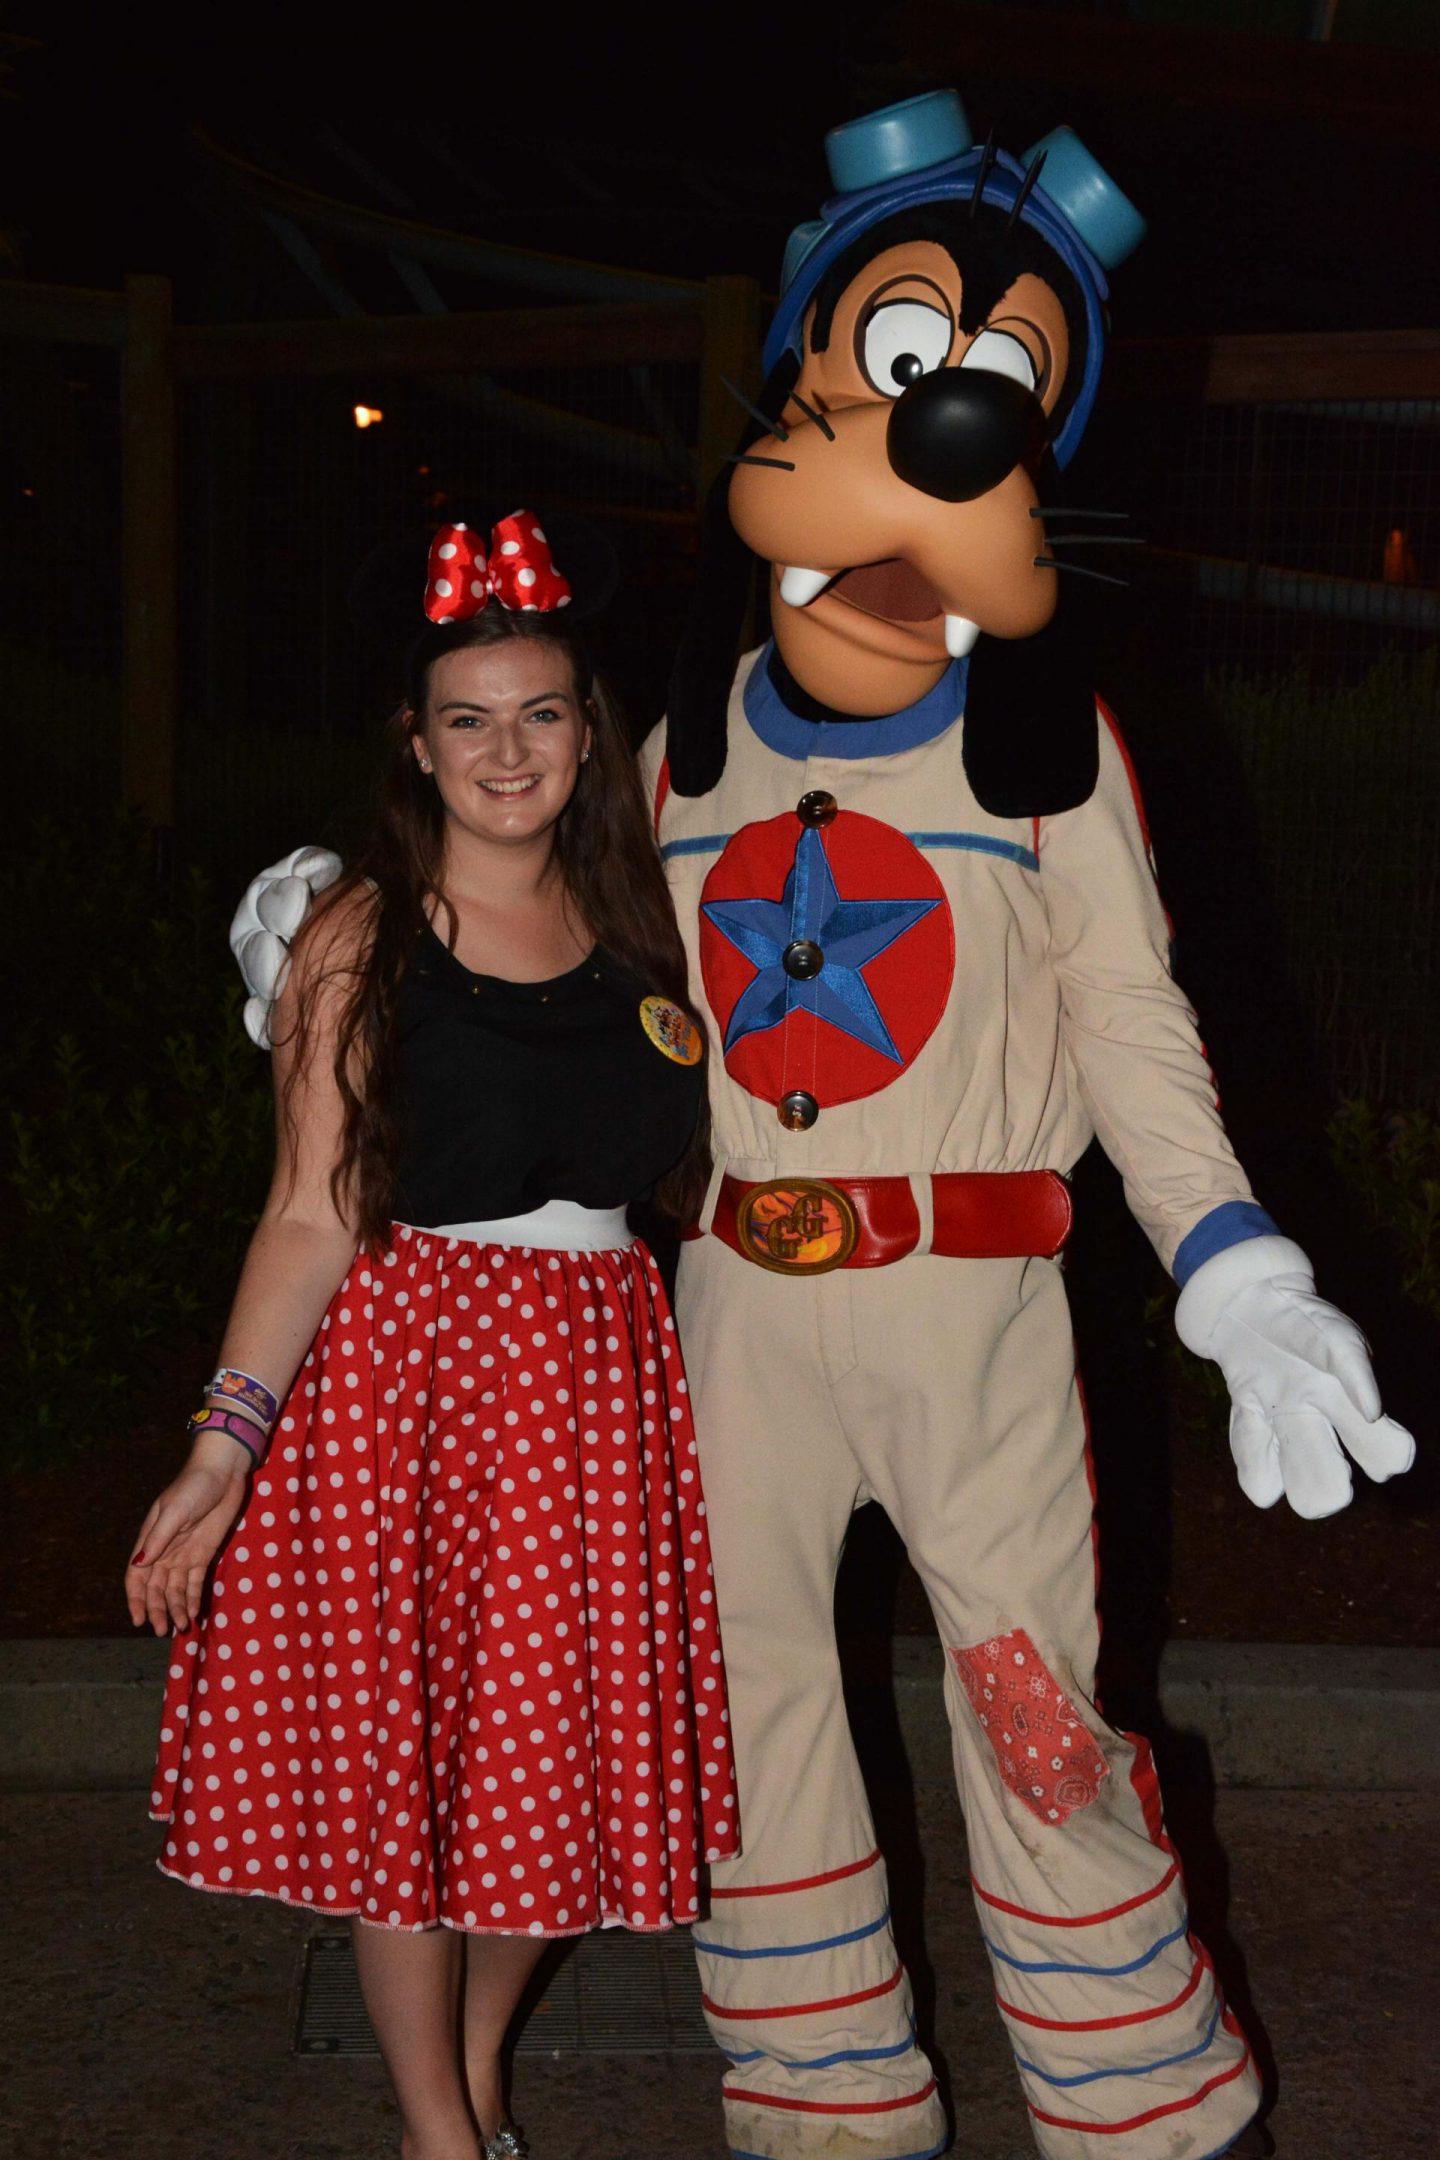 mickeys-not-so-scary-halloween-party-walt-disney-world-rachel-nicole-uk-travel-blogger-2